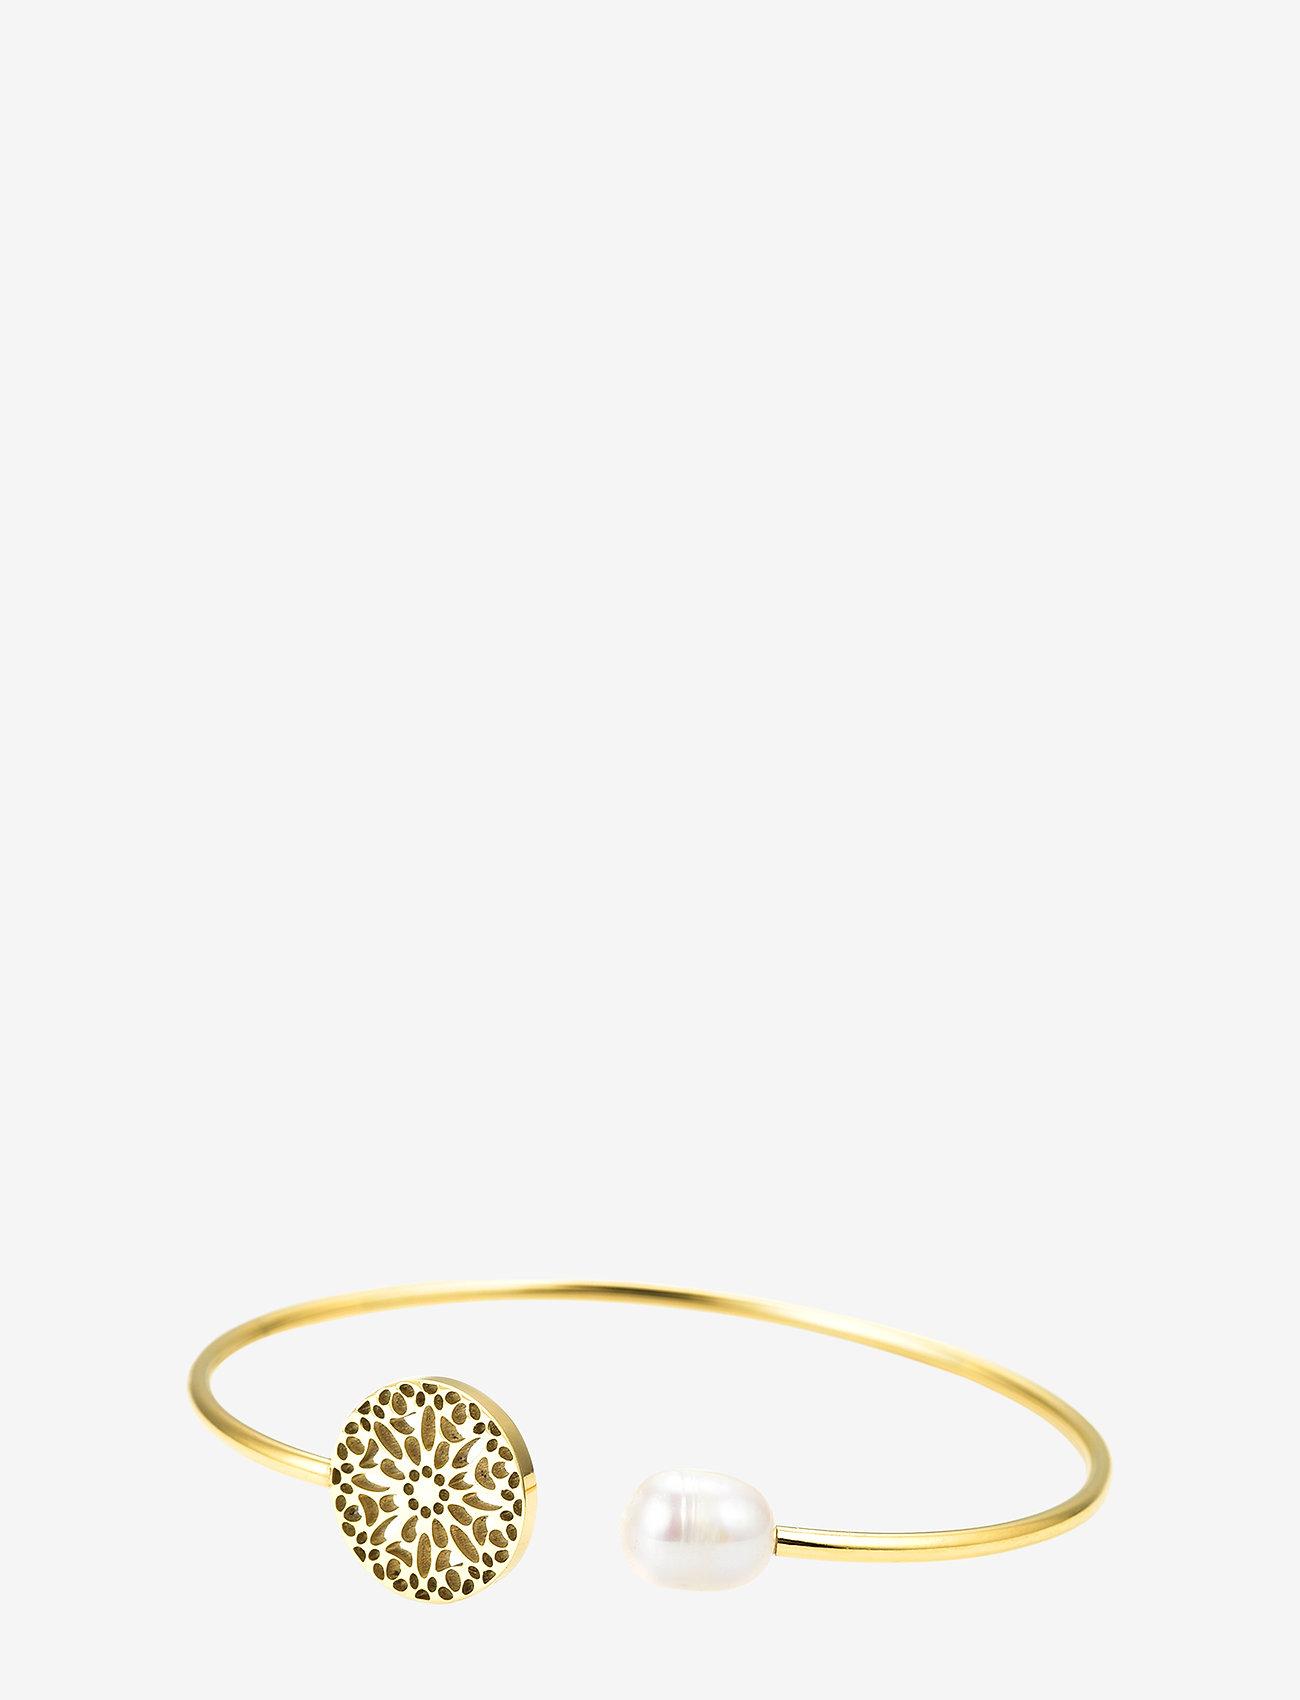 Bud to rose - Sence Pearl Bangle Gold - bangles - gold - 0